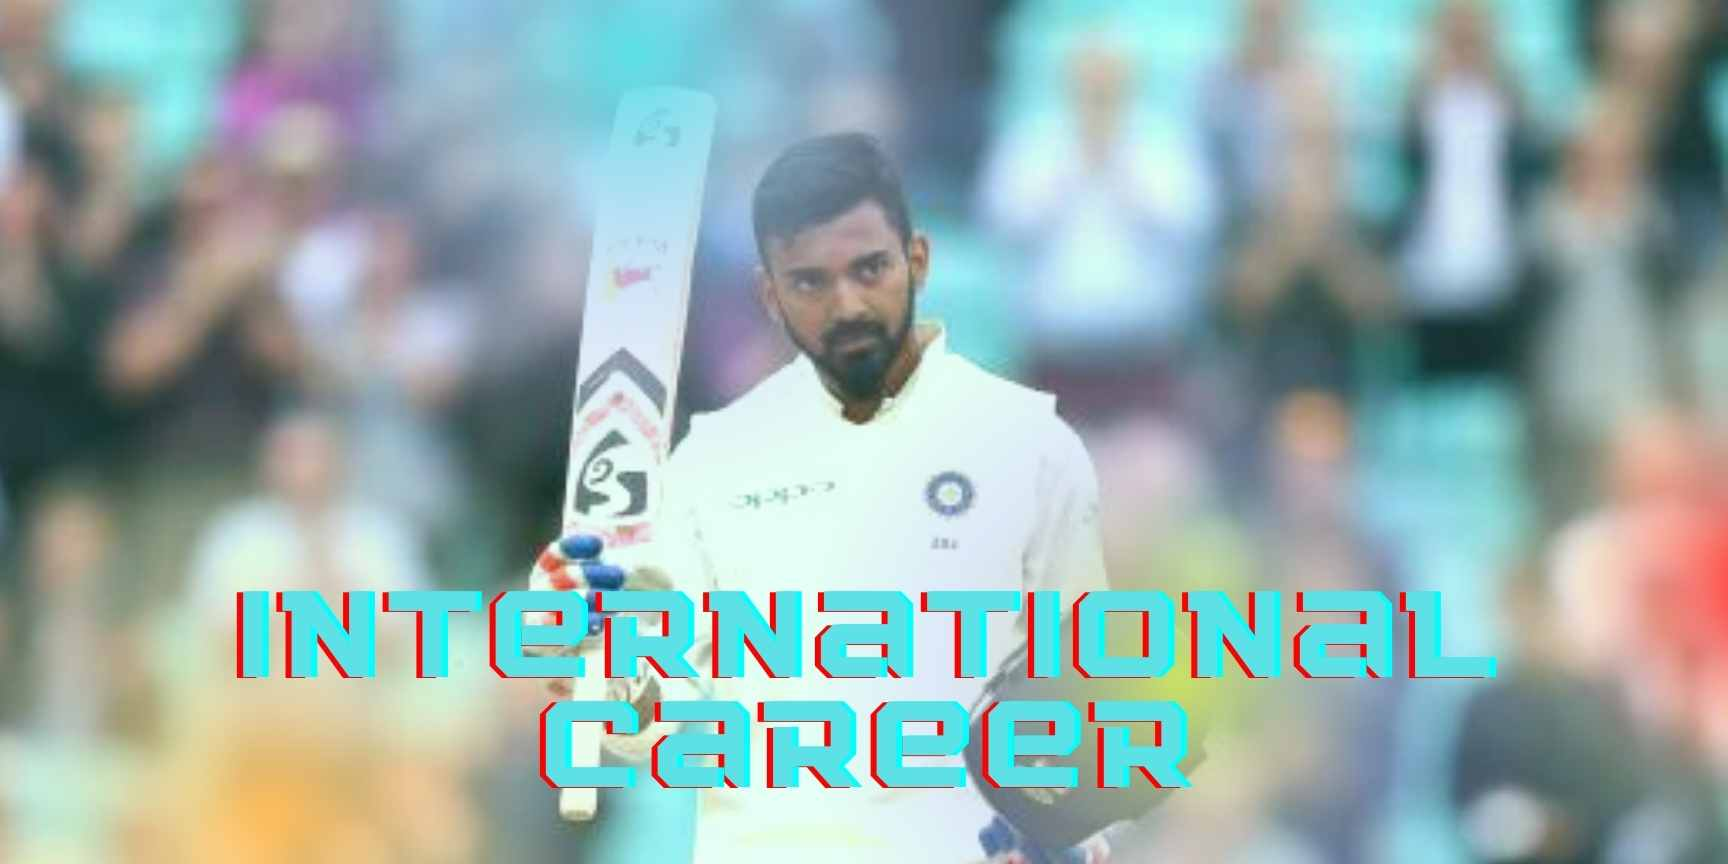 International career